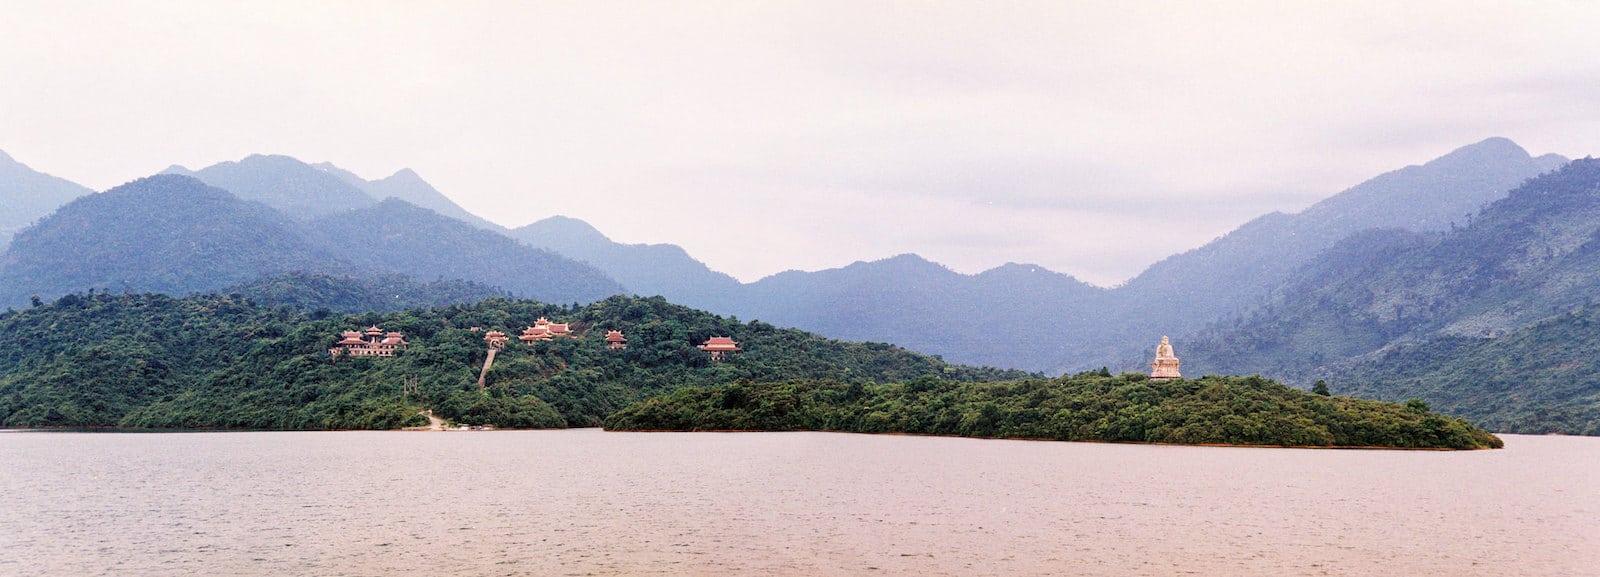 Image of Truc Lam Bach Ma Zen Monastery in Vietnam